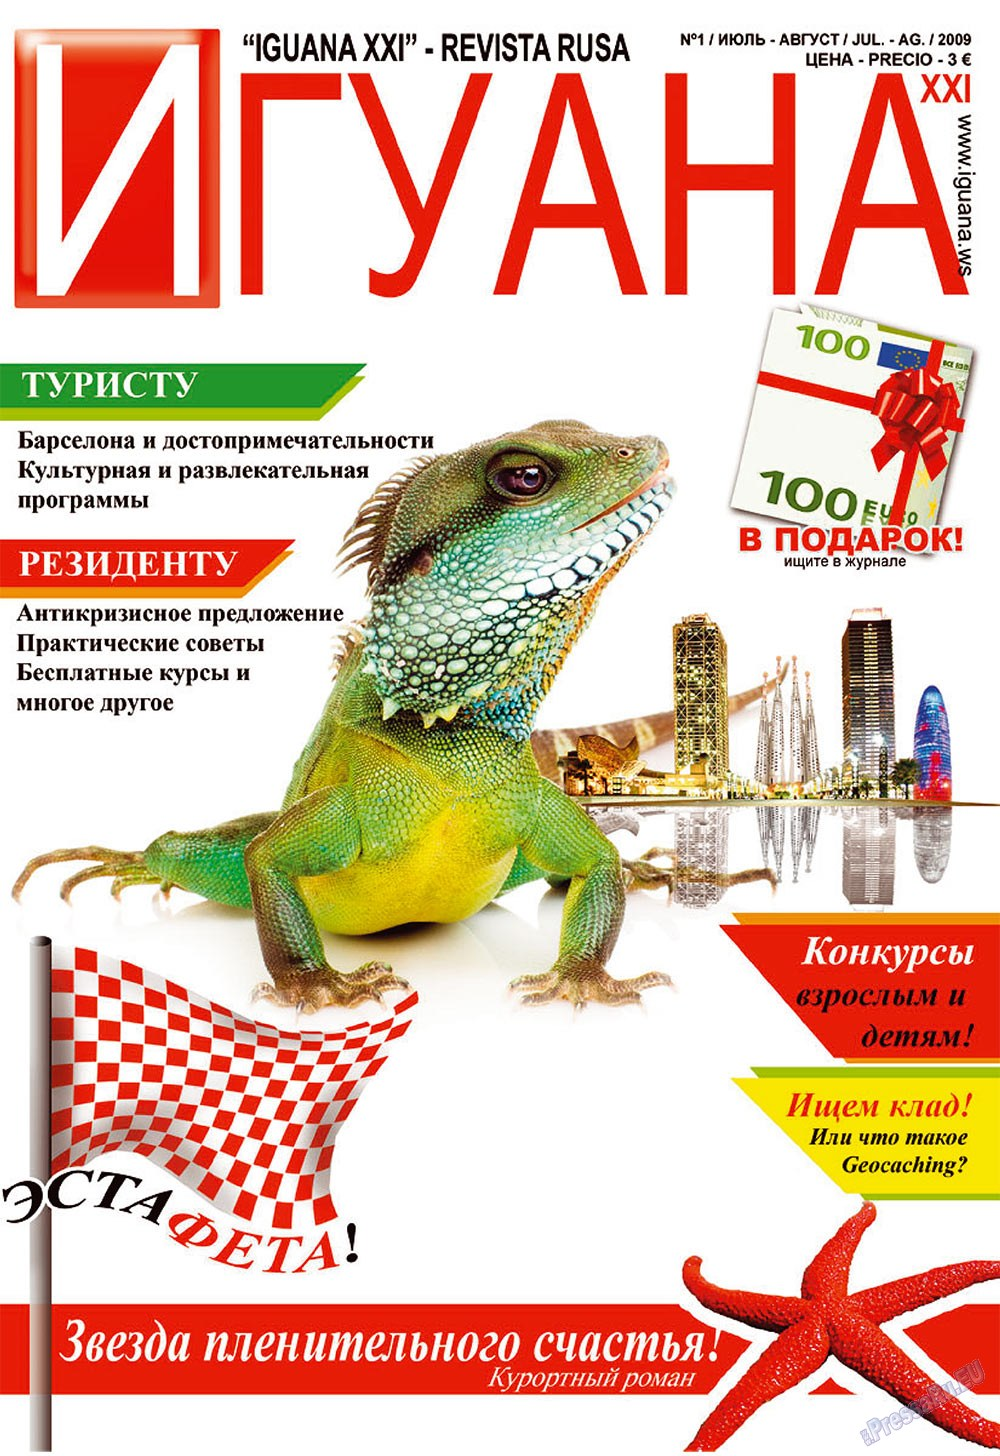 Игуана (журнал). 2009 год, номер 1, стр. 1